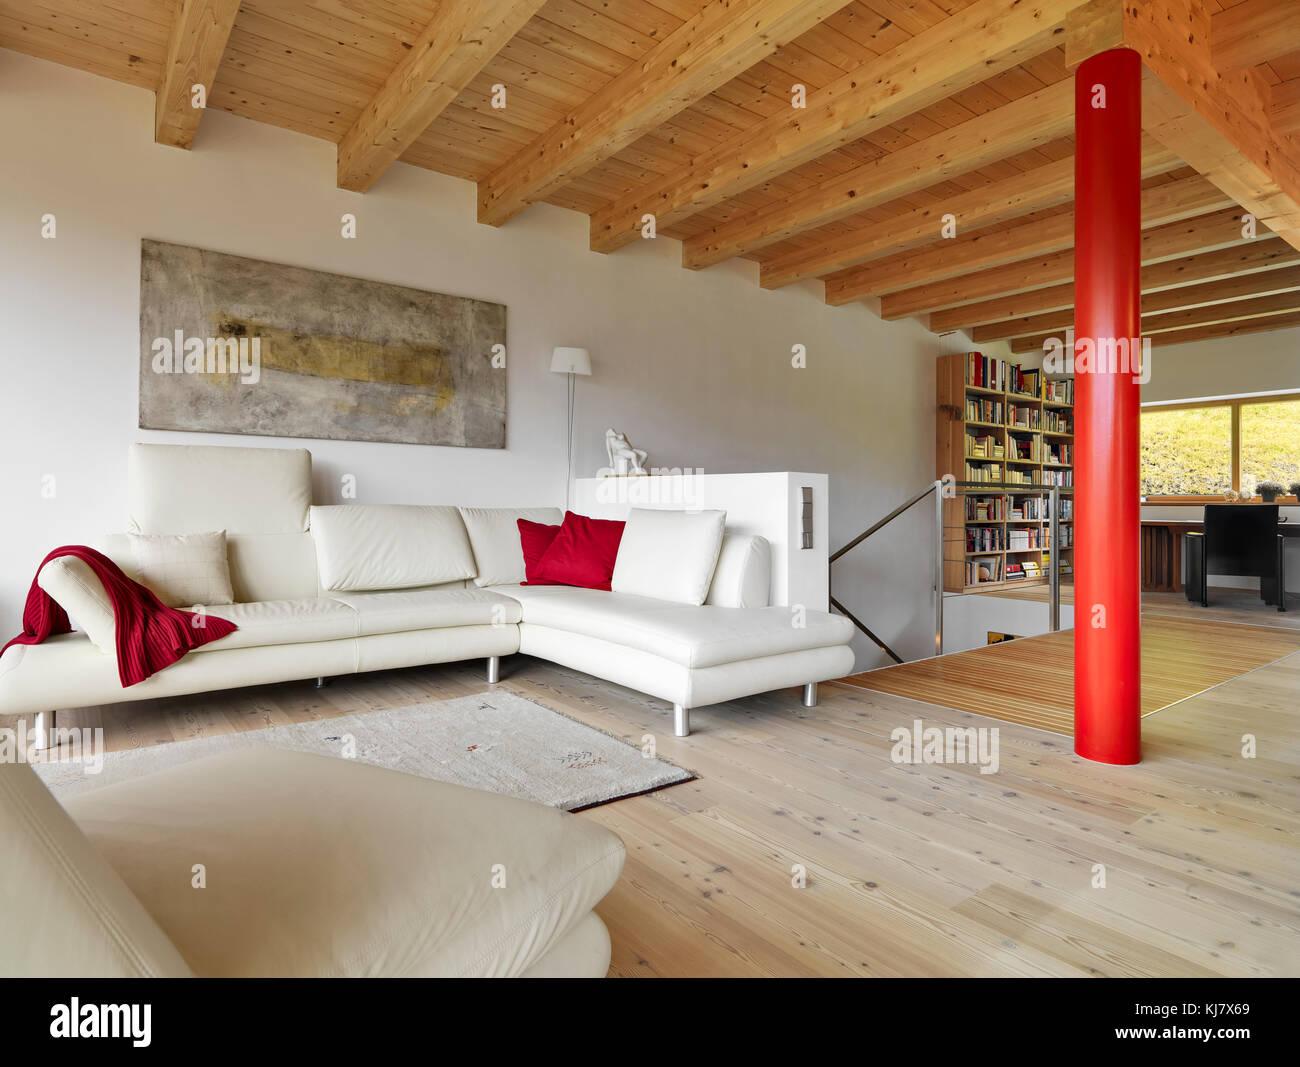 Awesome Holz Boden Und Decke Modern Interieur Photos - House Design ...